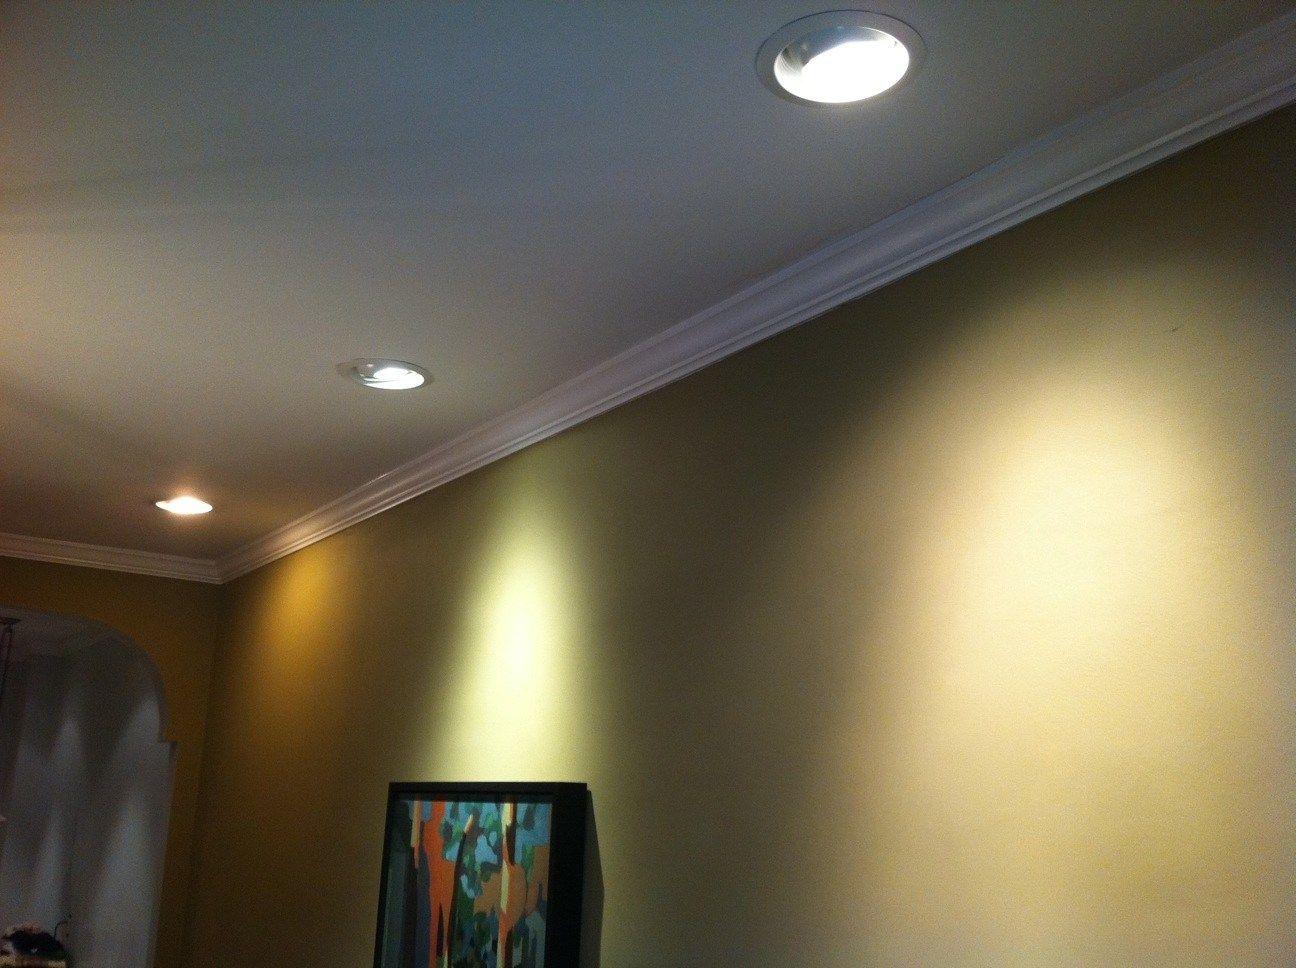 Recessed Wall Wash Light Fixture Interior Design Tips Etc